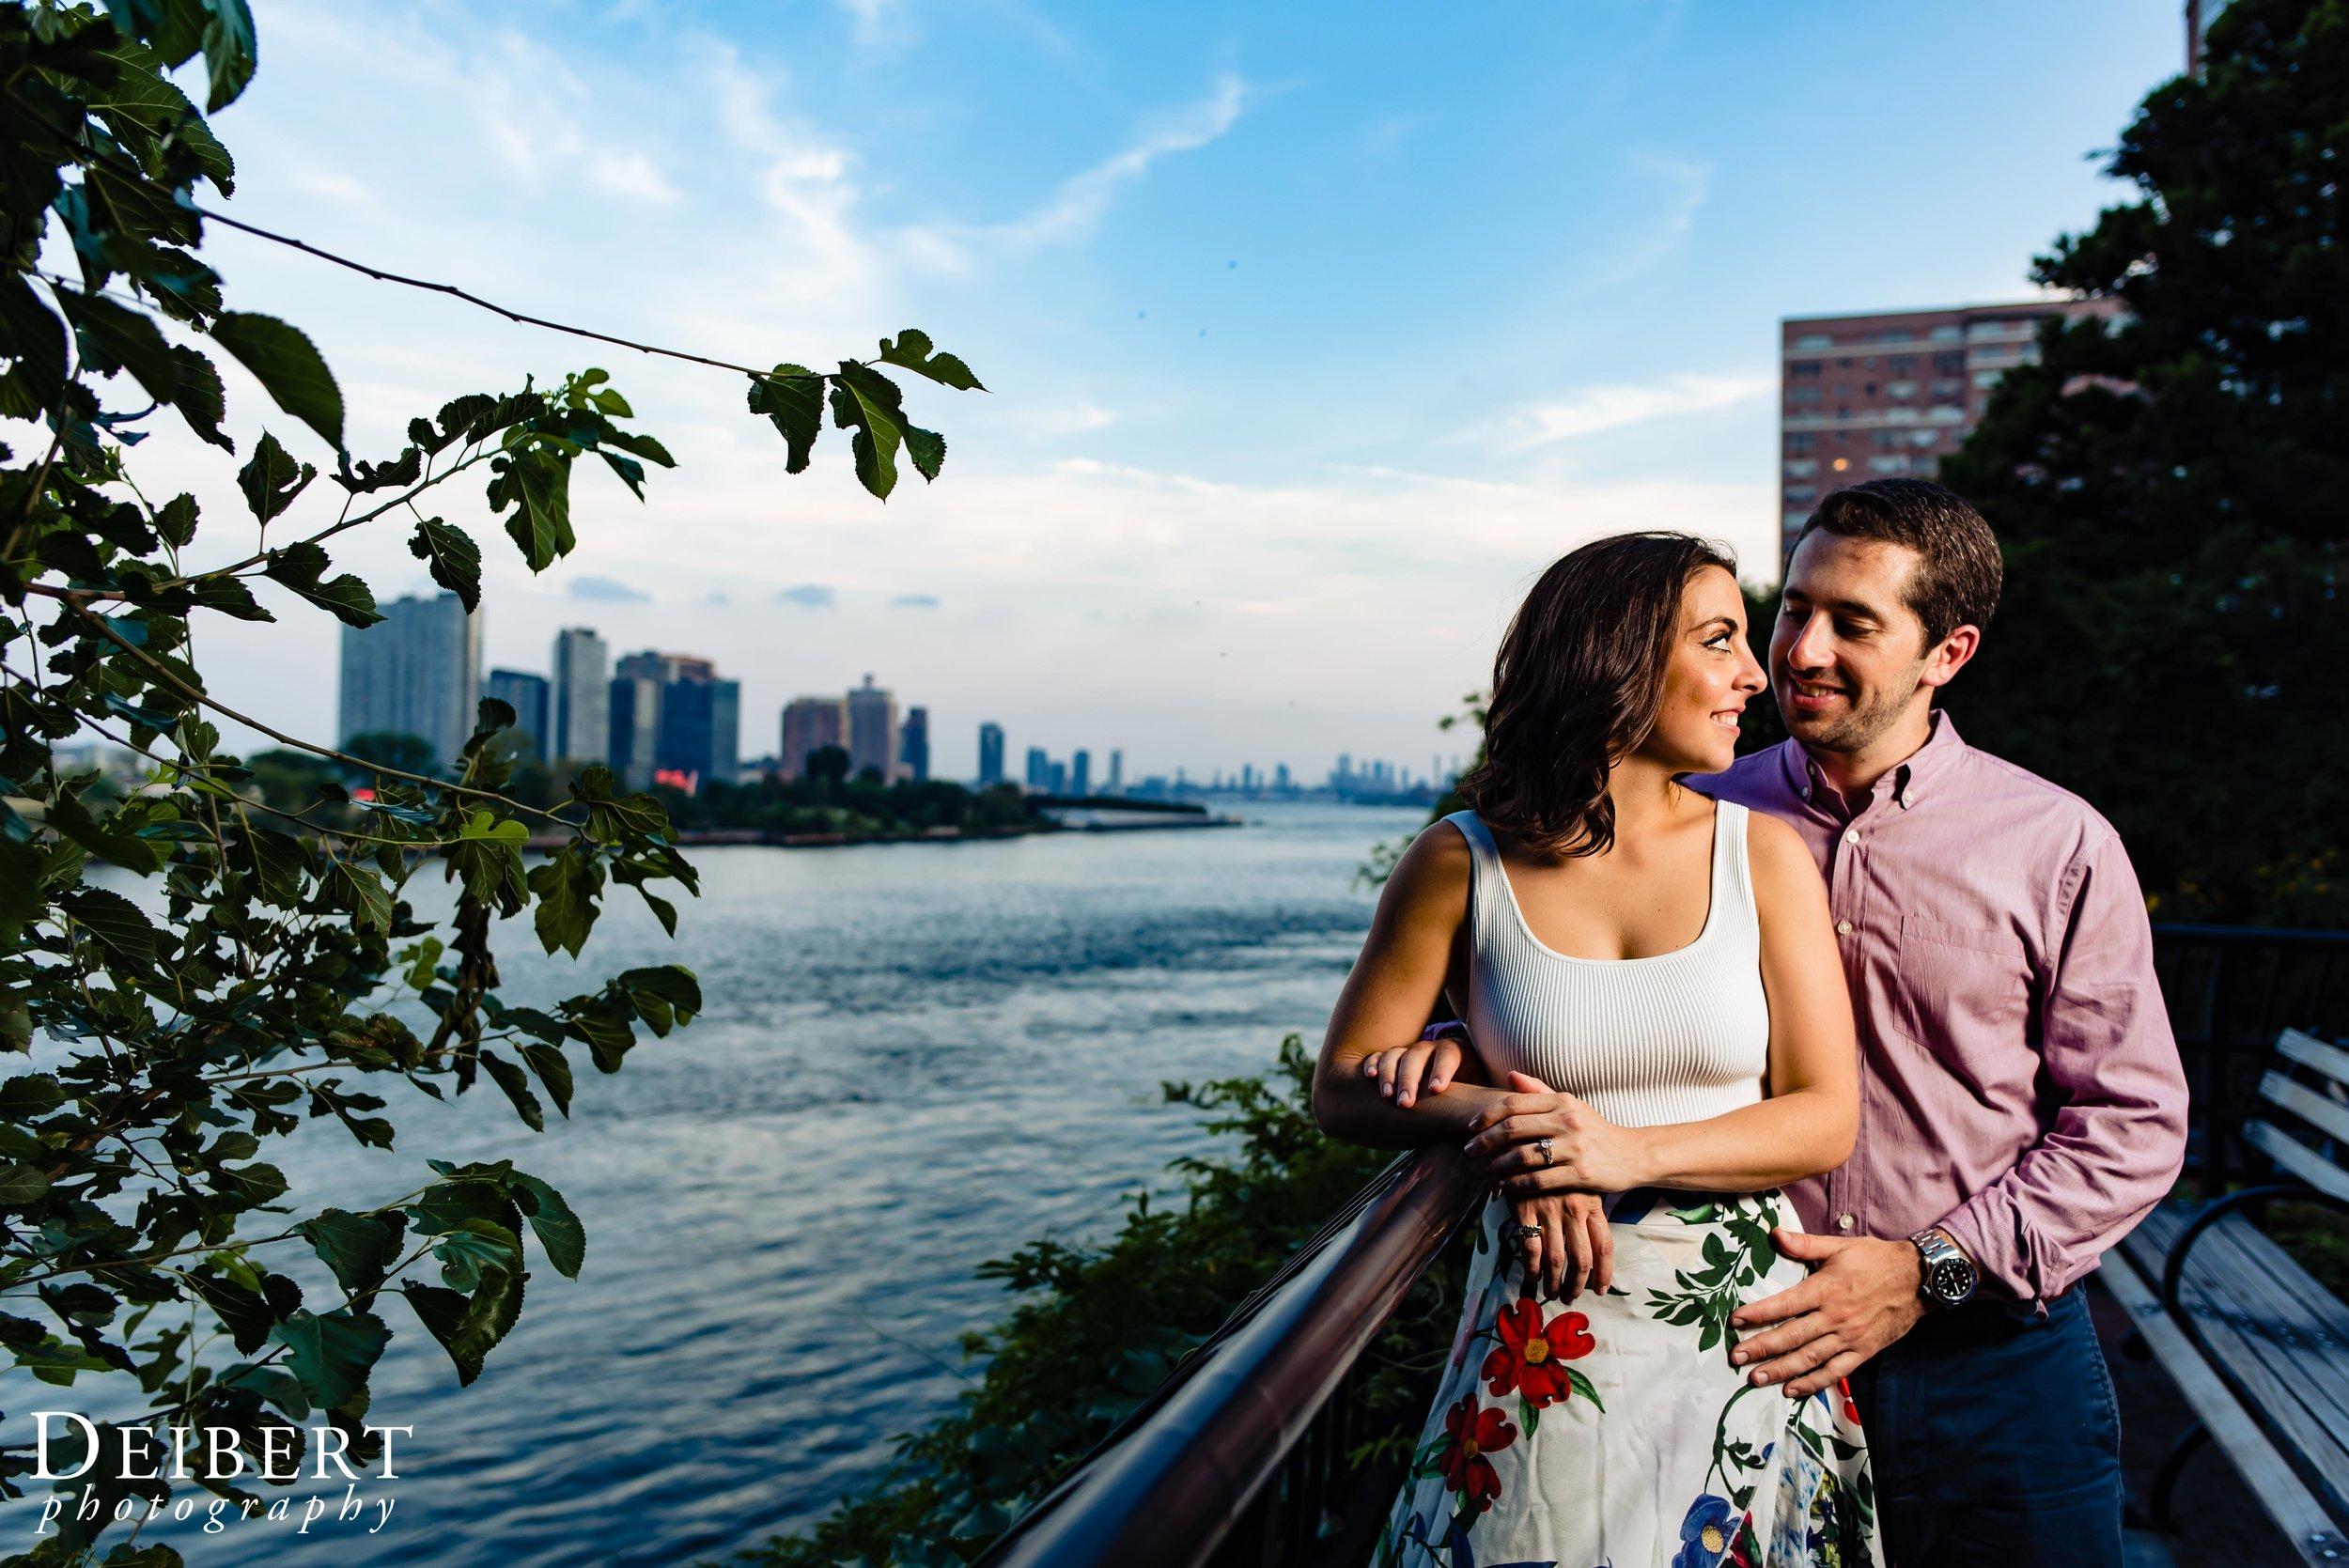 NYC_Tudor City_Sutton Place_Engagement-51.jpg